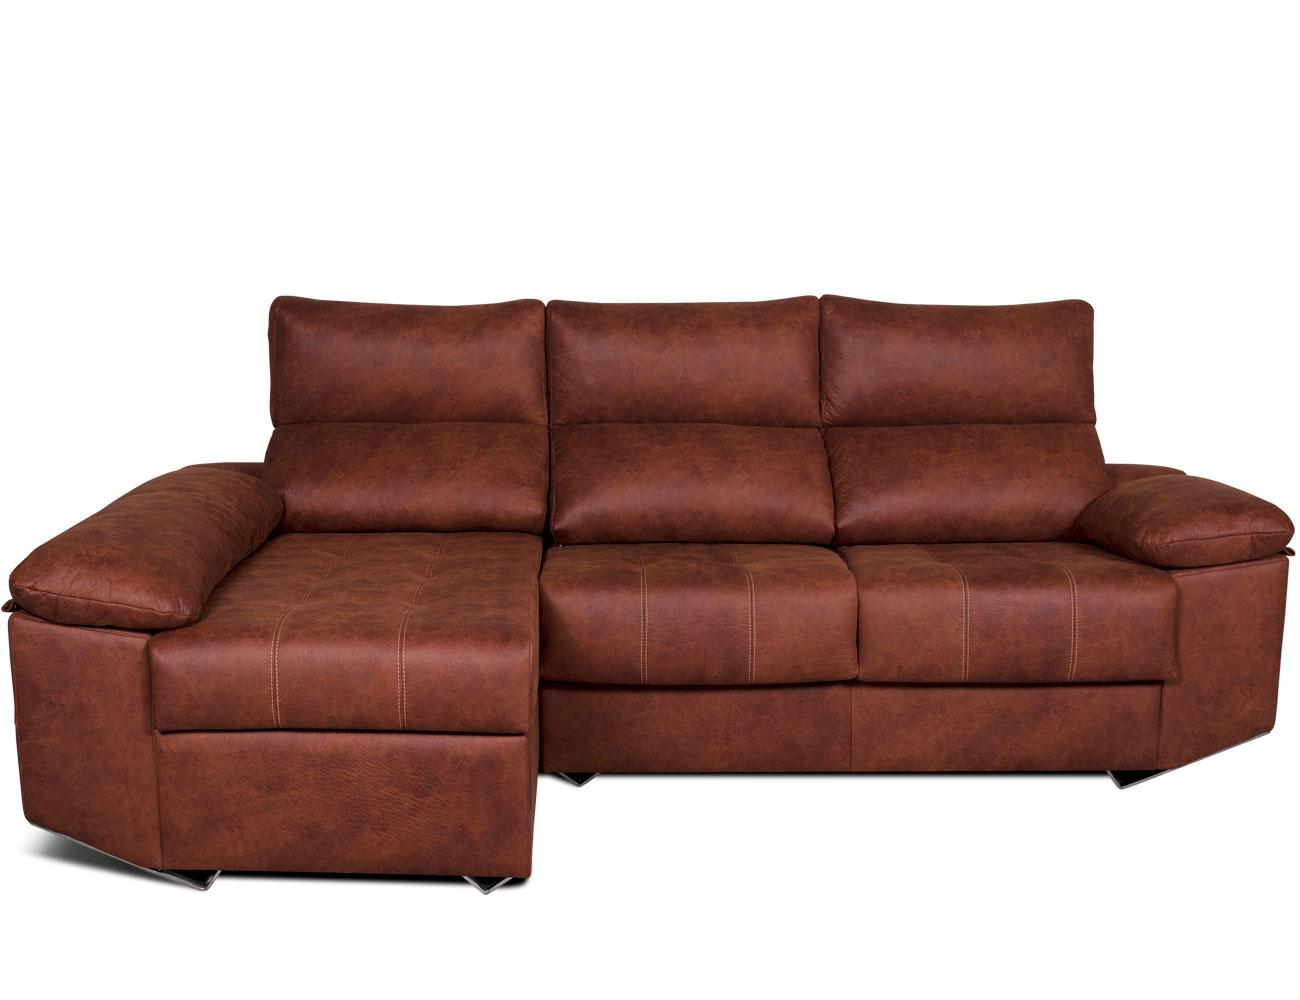 Sofa chaiselongue moderno patas forma tejido anti manchas 211